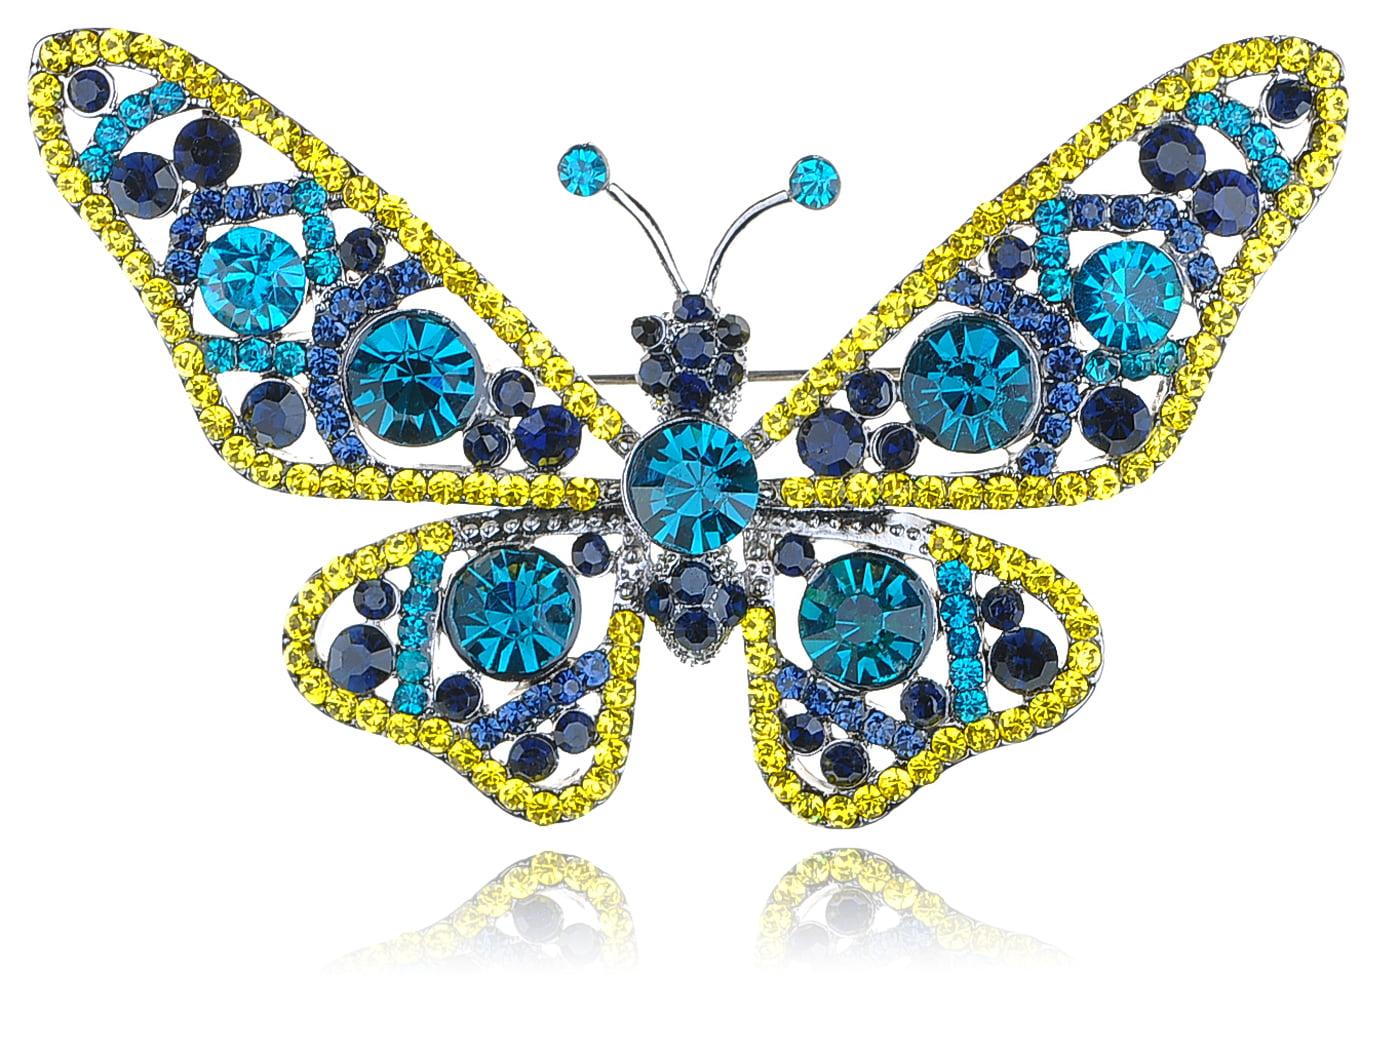 Capri Blue Light Topaz Crystal Rhinestone Silver Tone Butterfly Bug Pin Brooch by